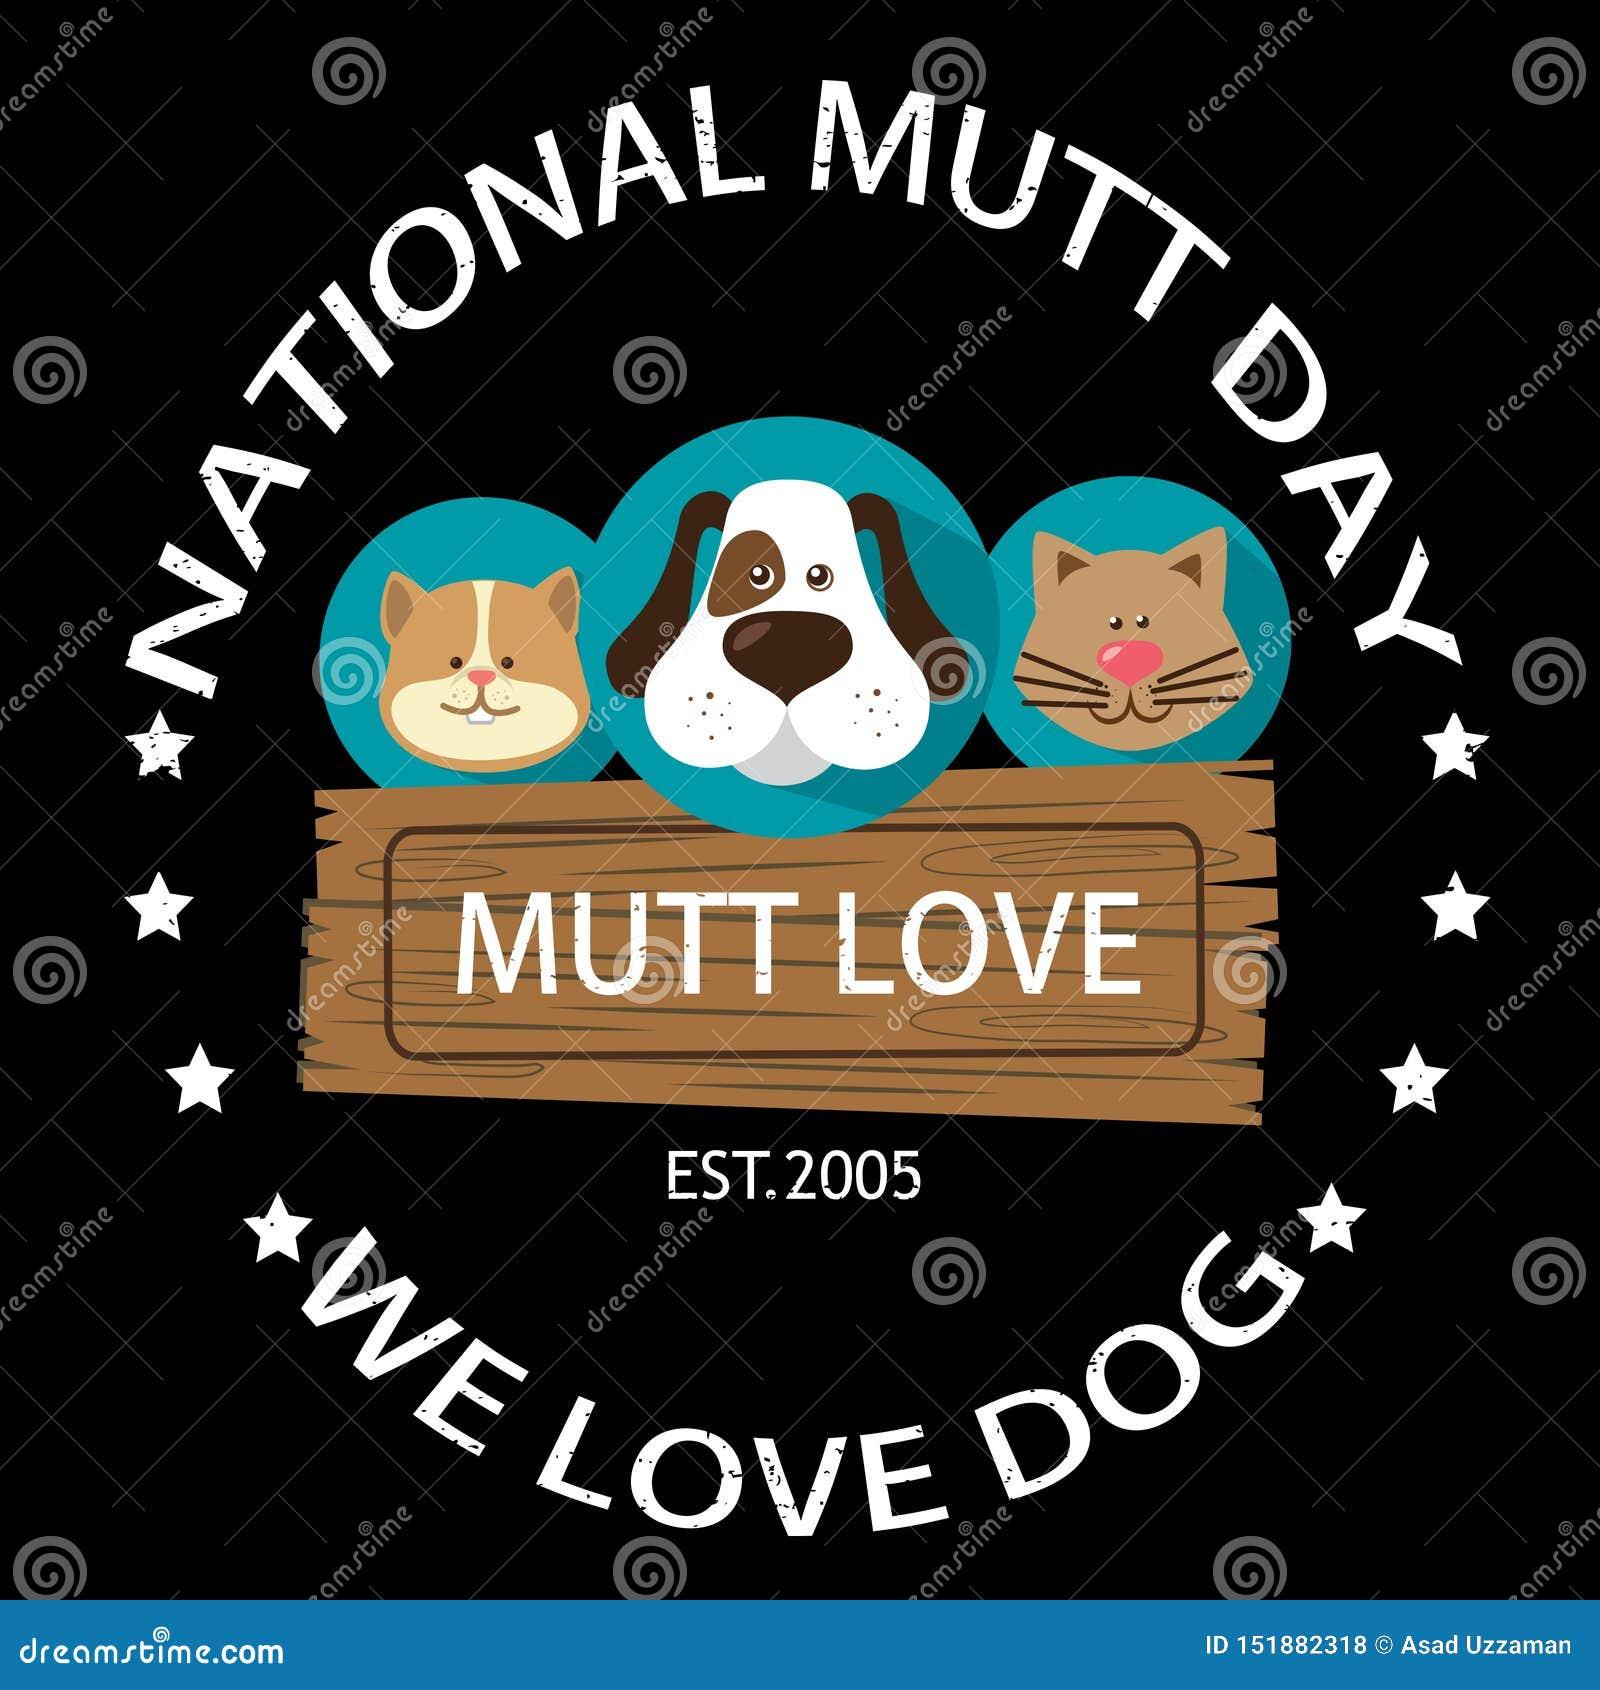 Nationaal Mutt Day